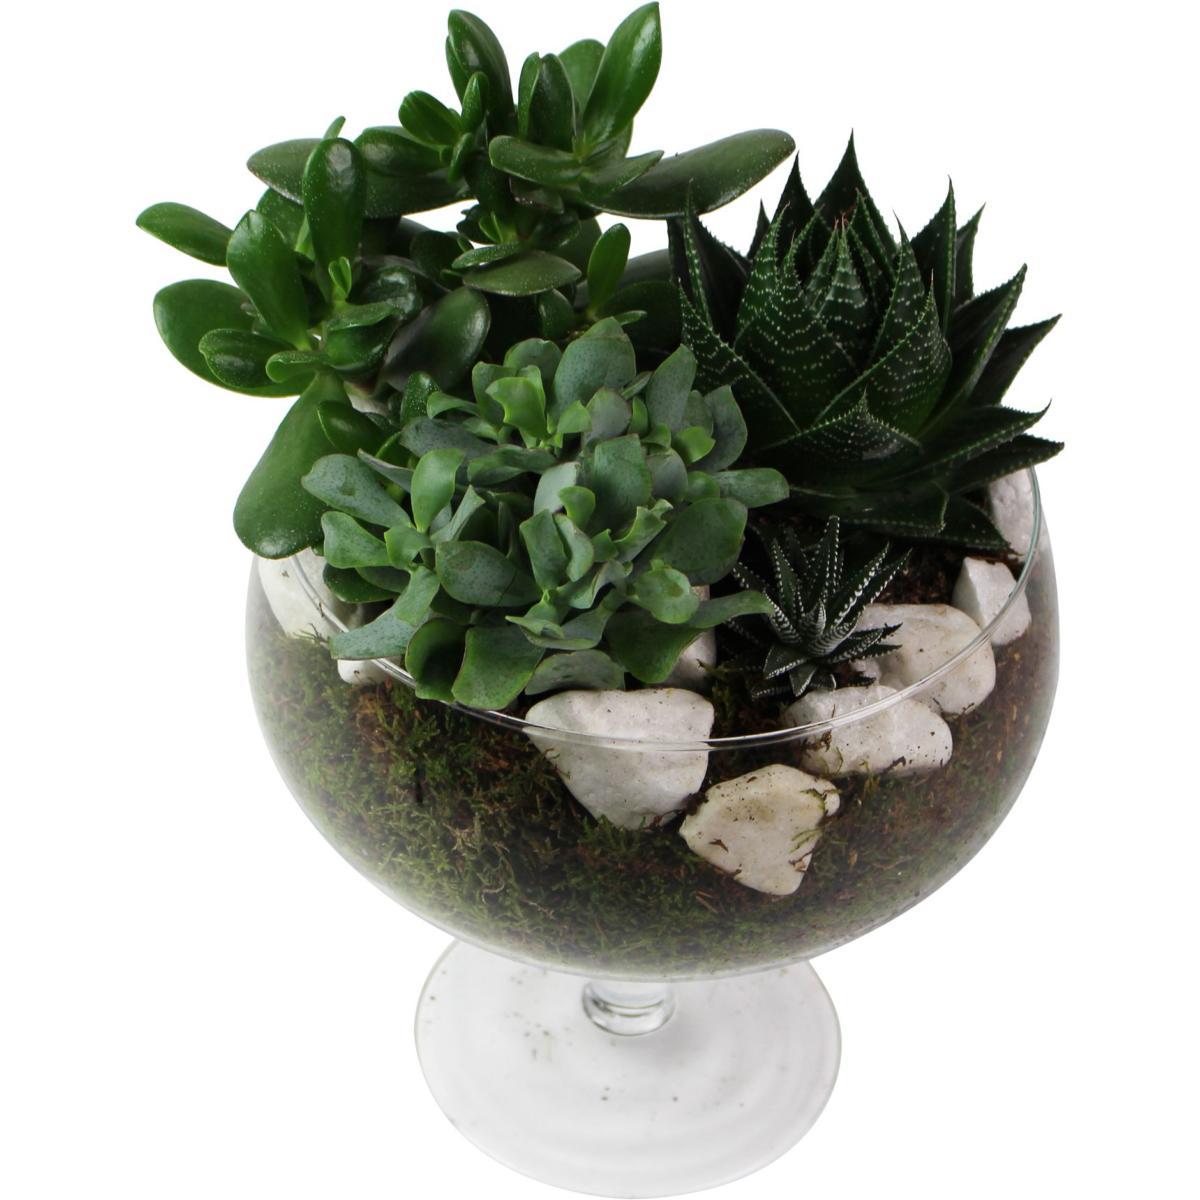 plantes grasses photos kr39 humatraffin. Black Bedroom Furniture Sets. Home Design Ideas